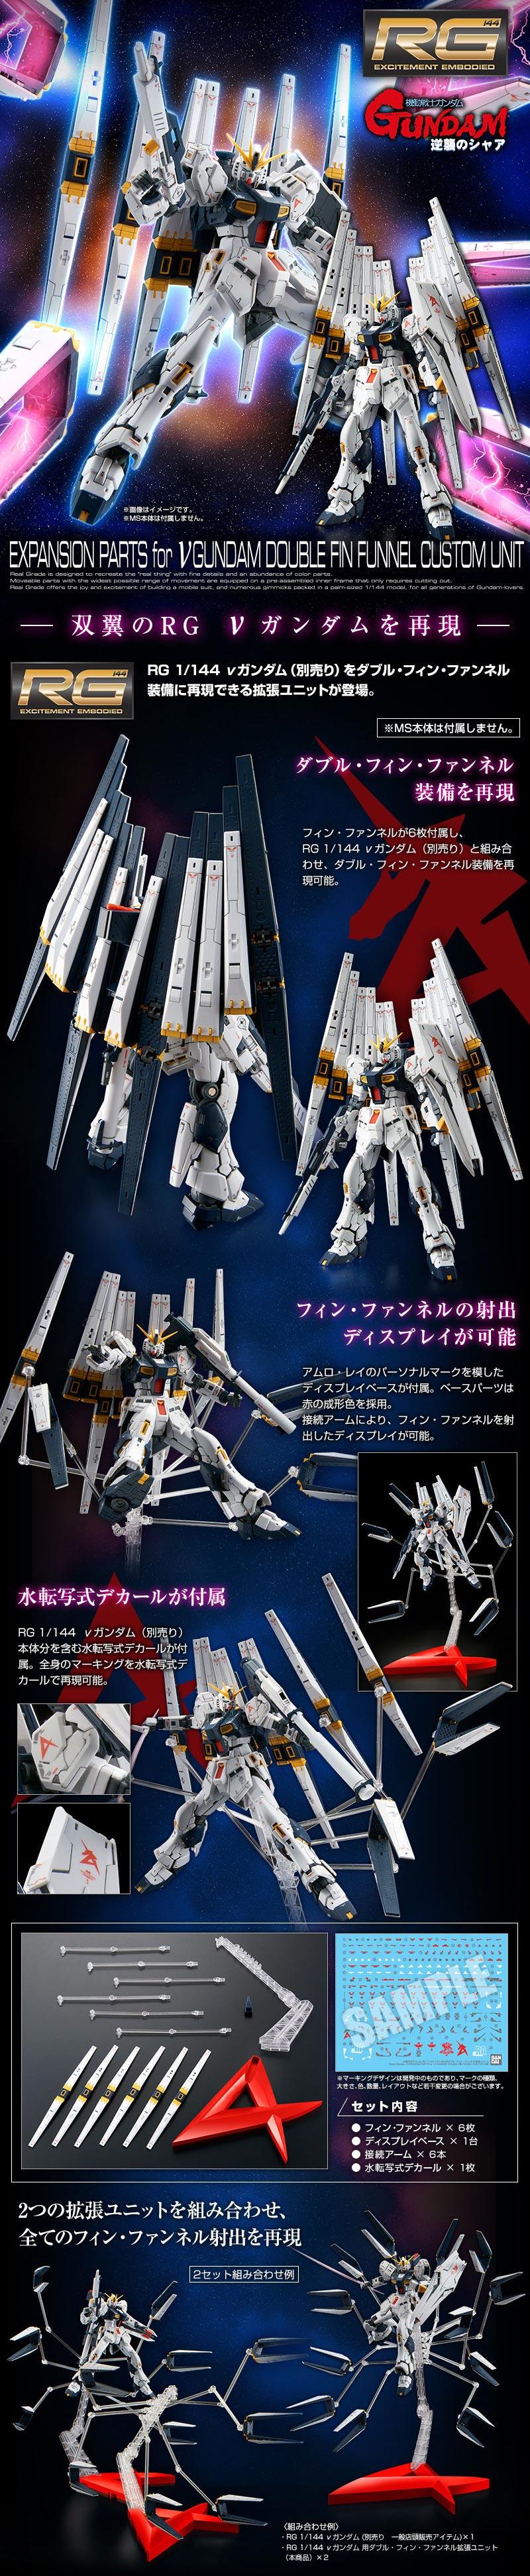 RG Expansion Parts for Nu Gundam Double Fin Funnel Custom Unit Details